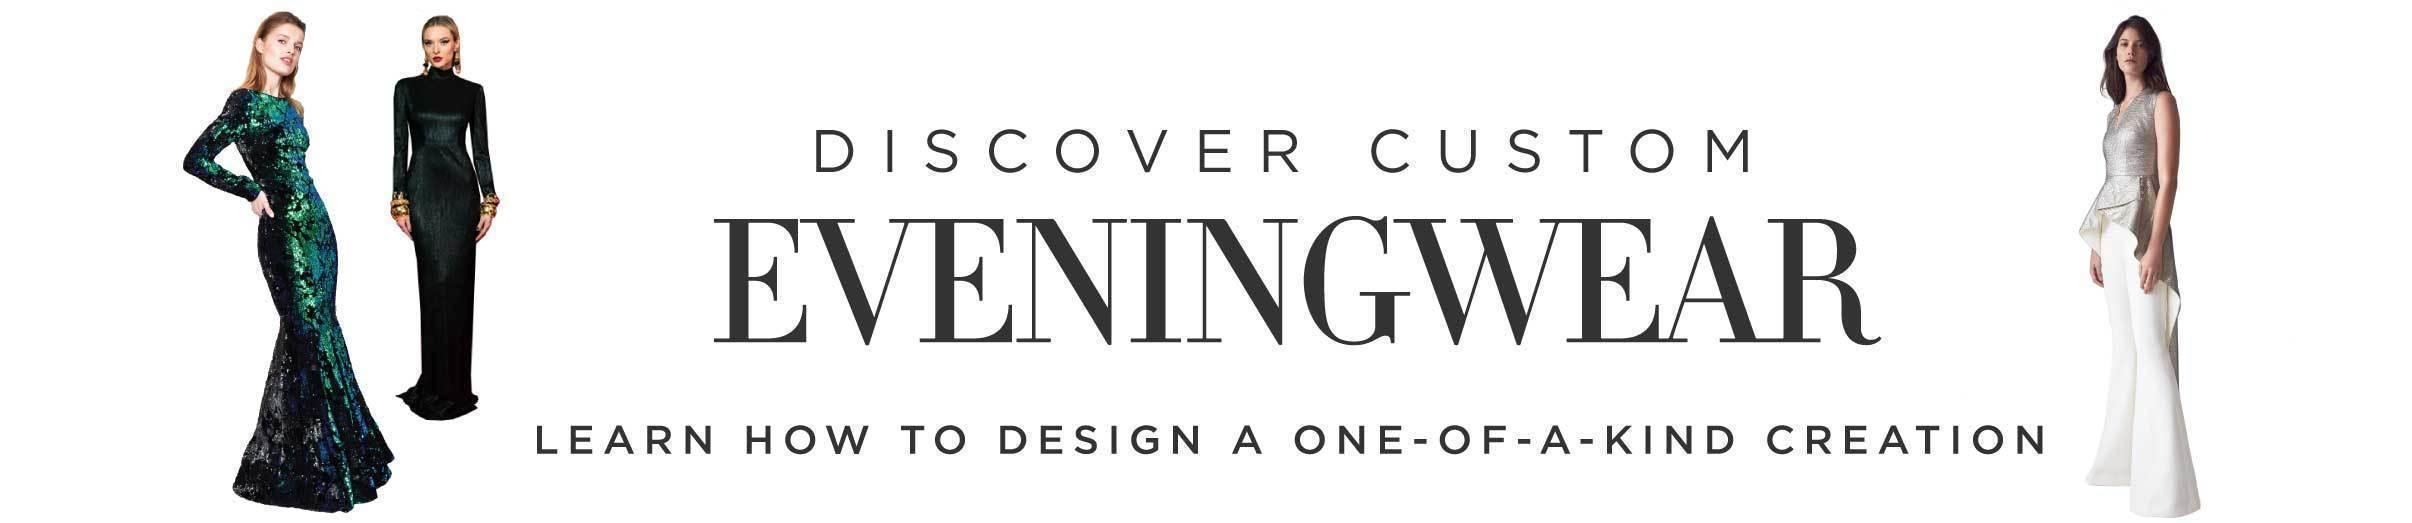 Discover Custom Eveningwear